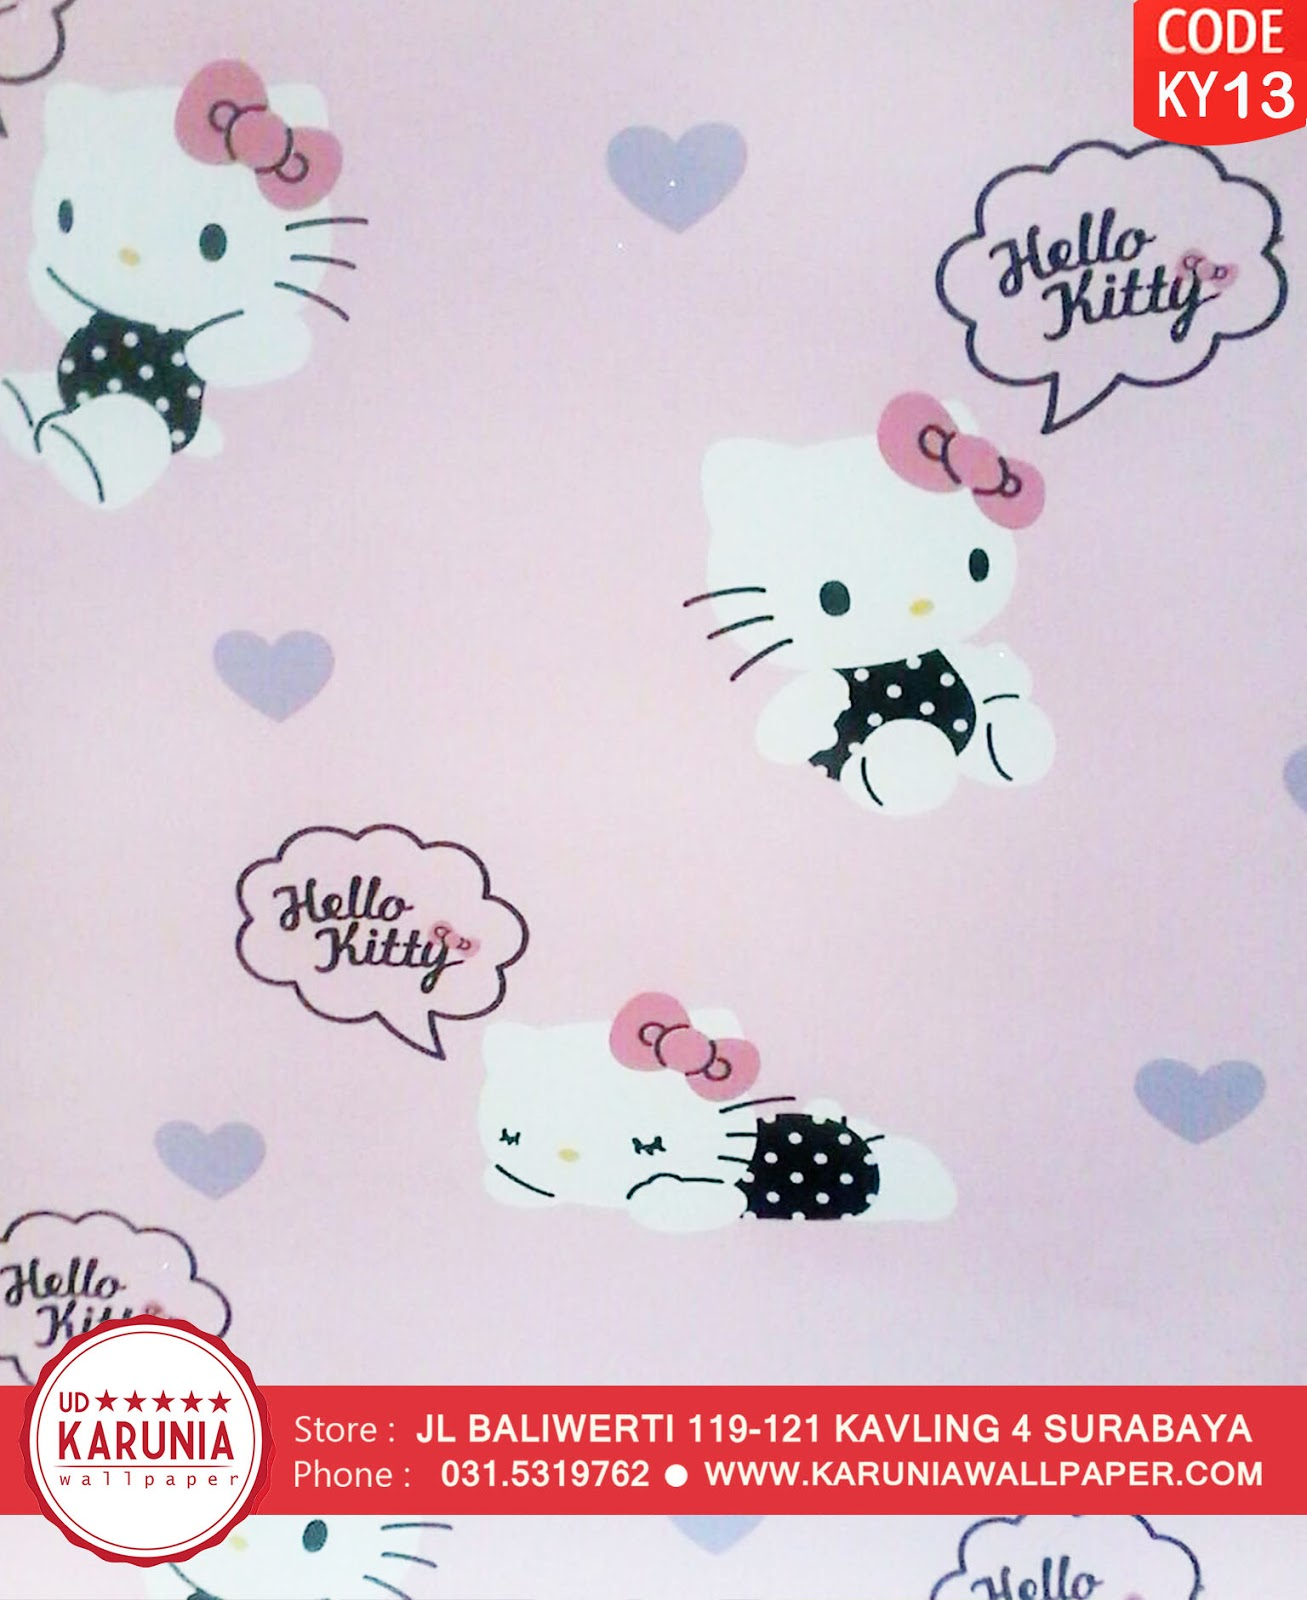 Wallpaper Wa Hd Kartun